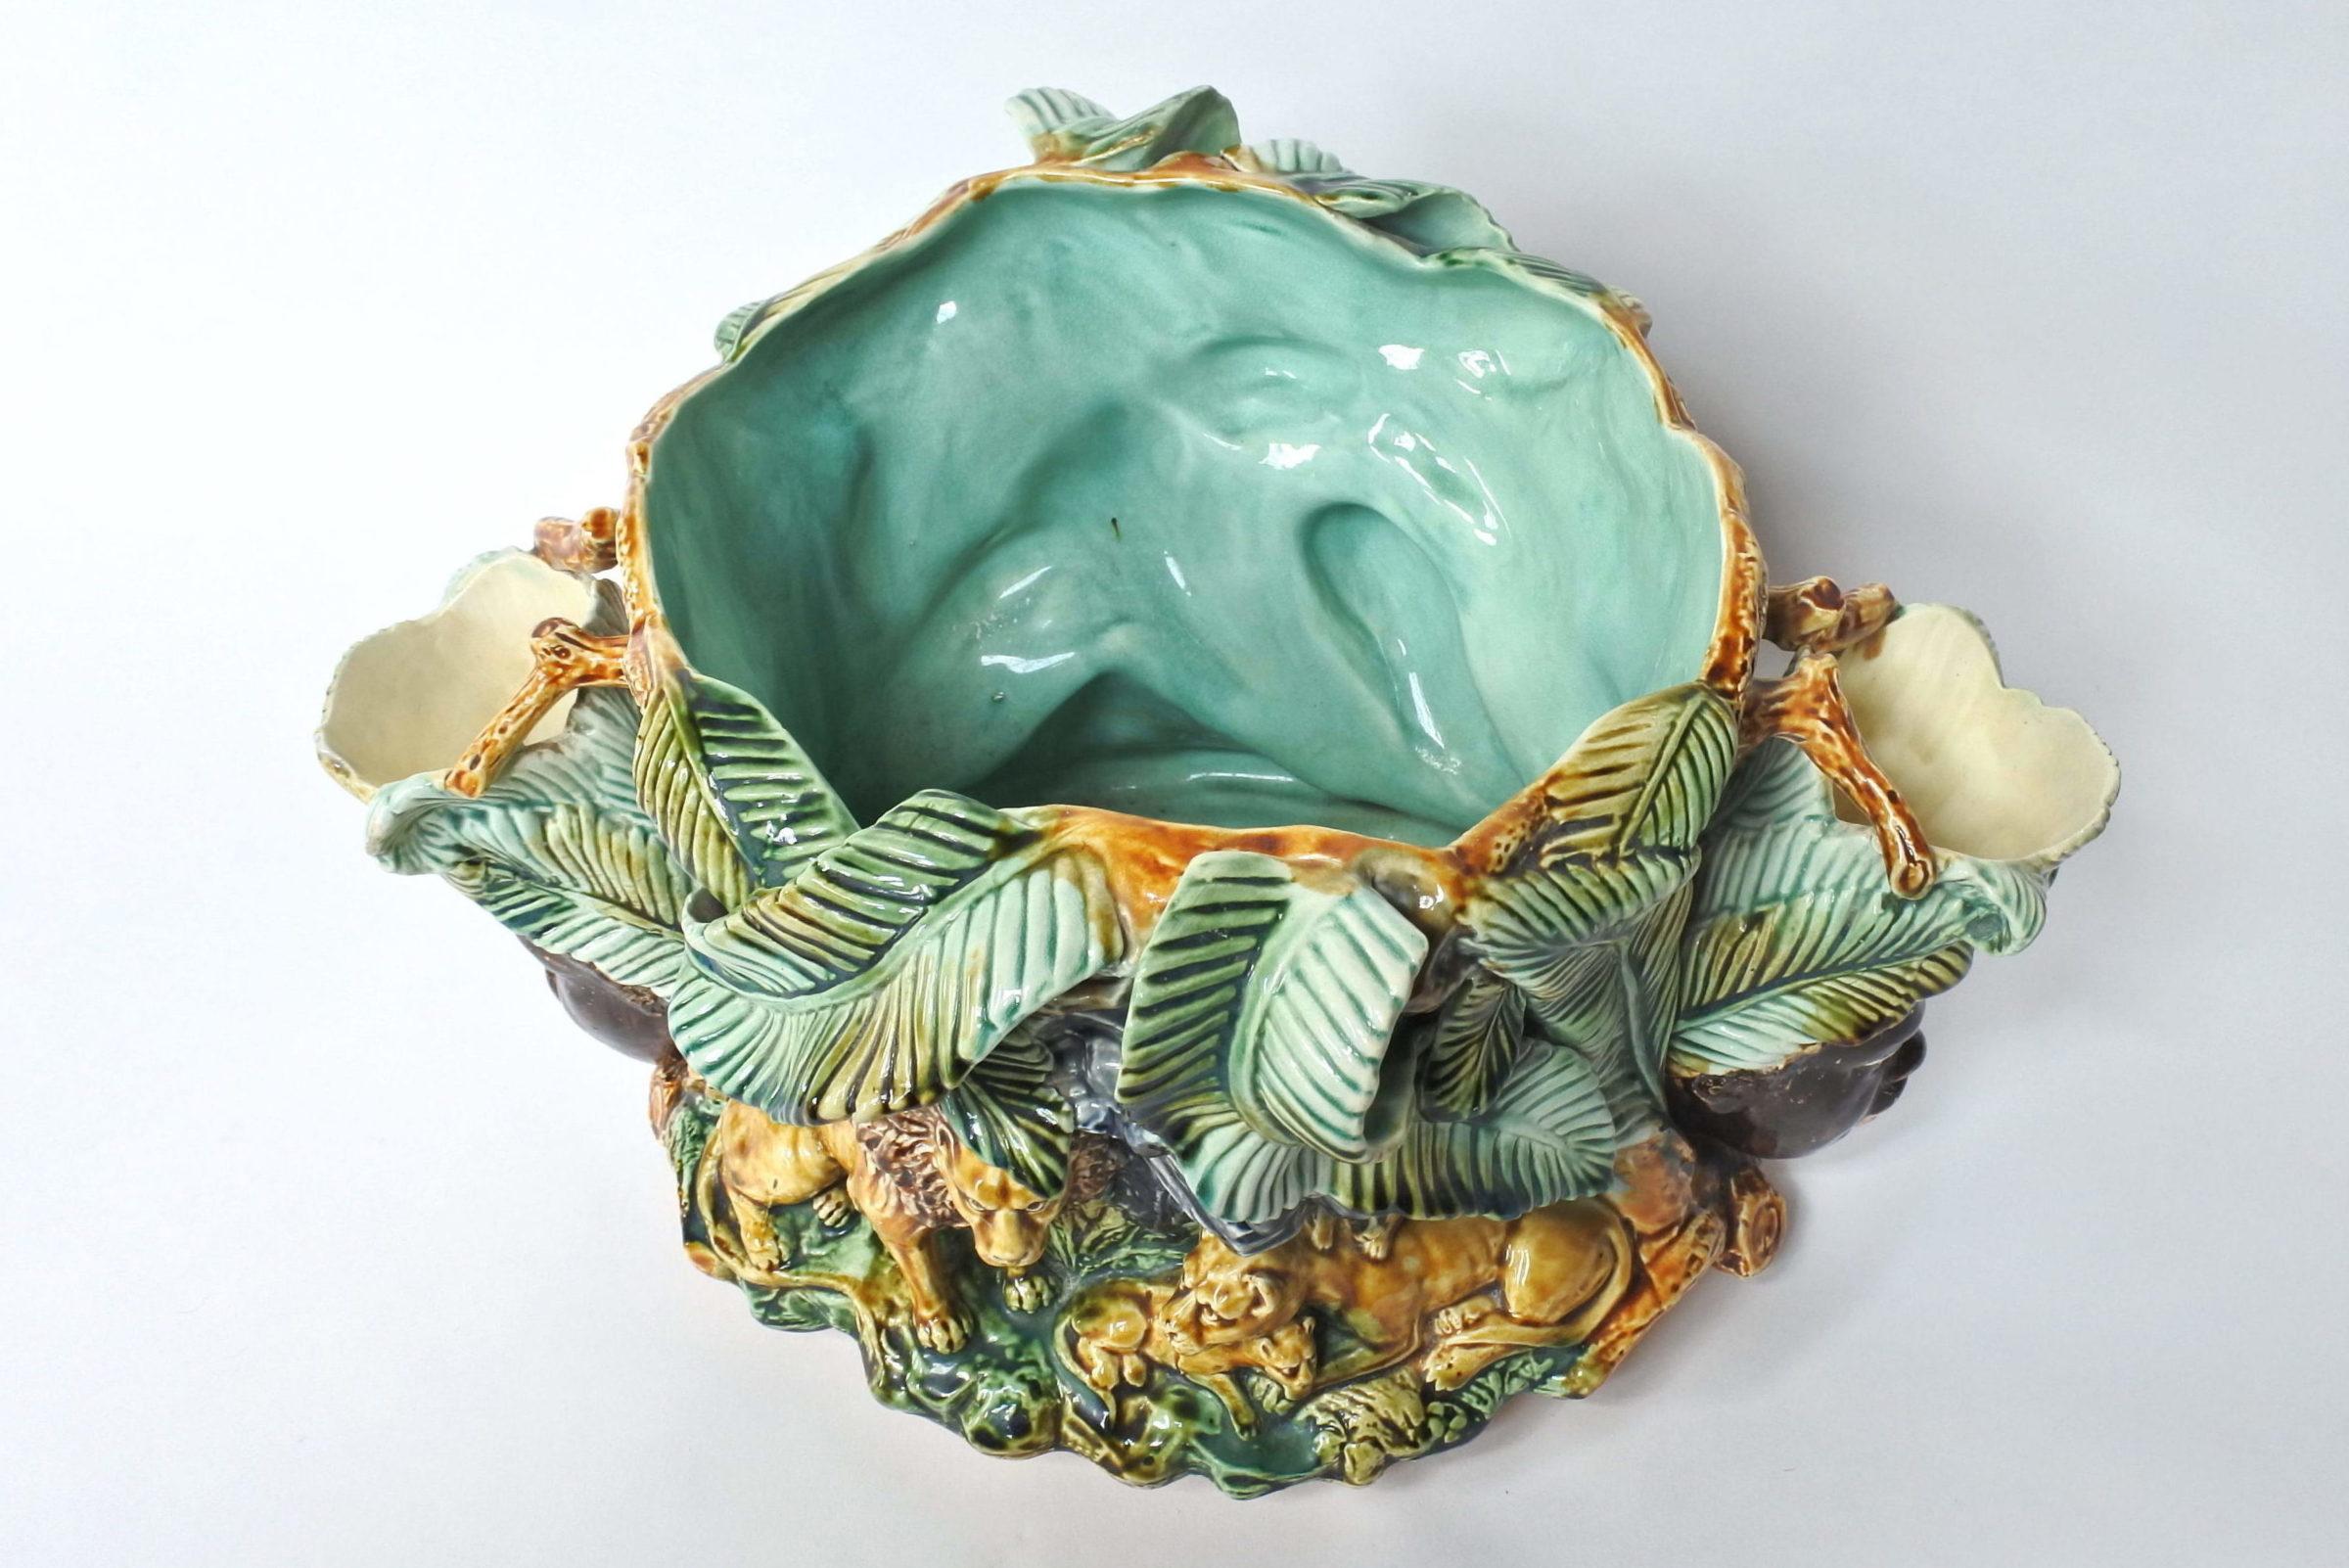 Centrotavola in ceramica barbotine con funzione di jardinière - Onnaing - 10